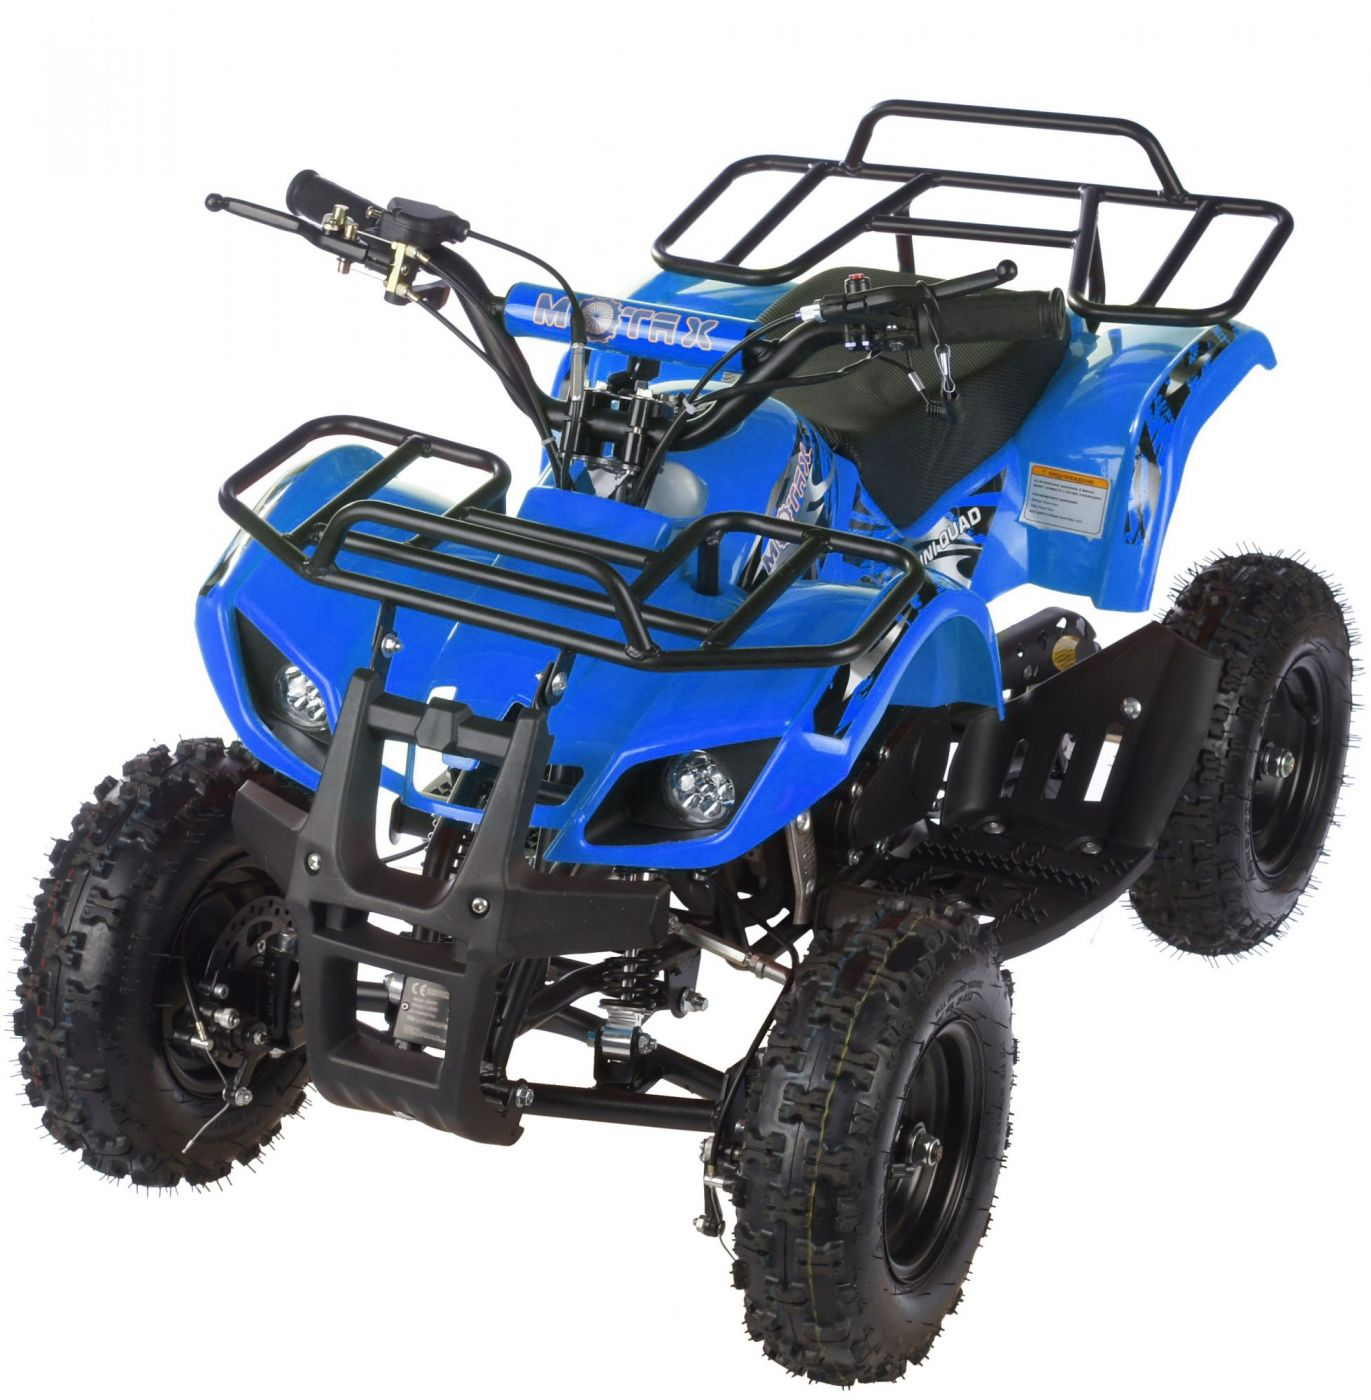 MOTAX ATV Mini Grizlik Х-16 ручной стартер Квадроцикл бензиновый